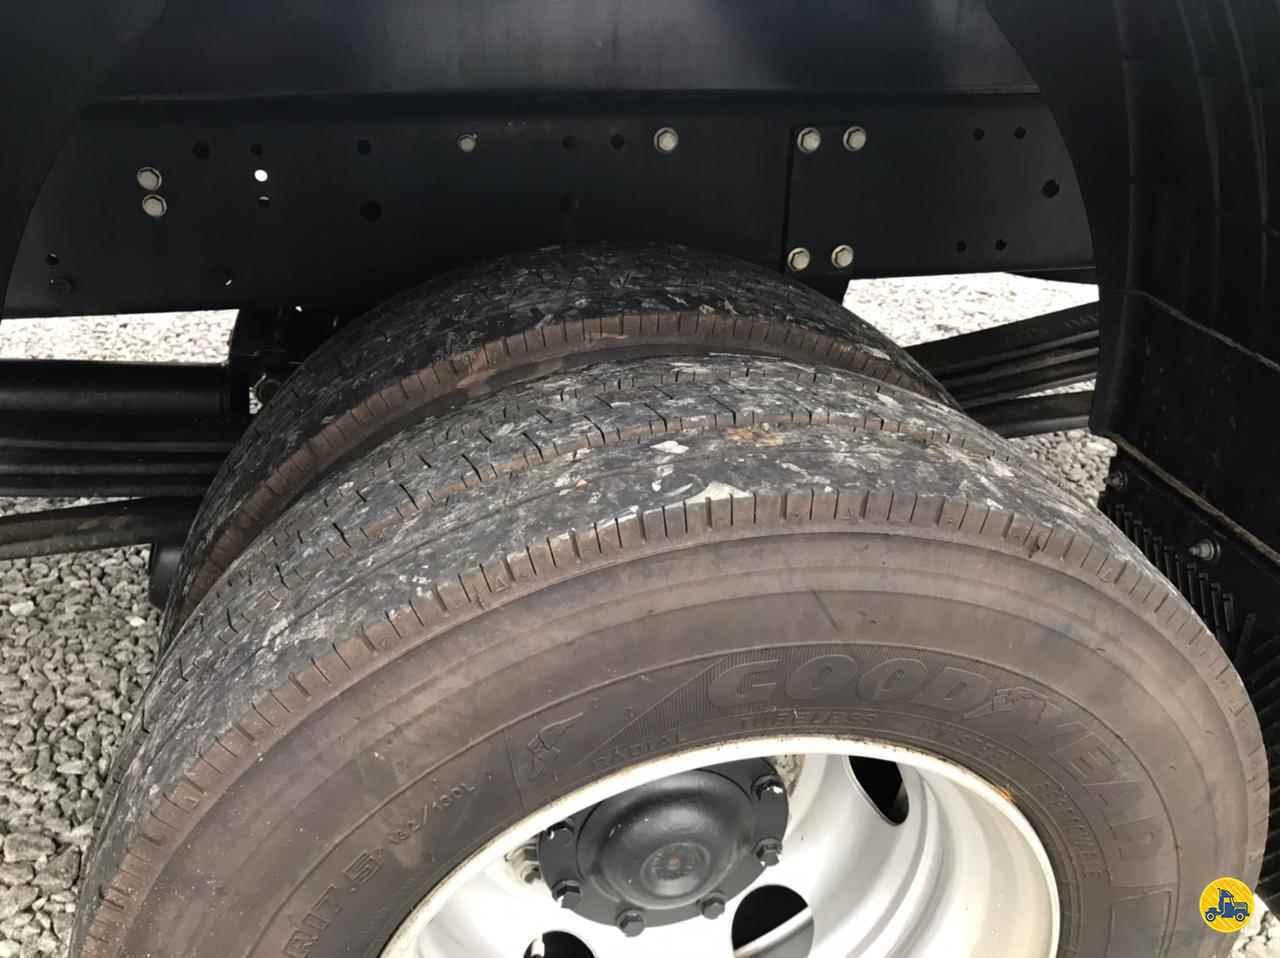 MERCEDES-BENZ MB 1016 33240km 2019/2020 Prime Caminhões